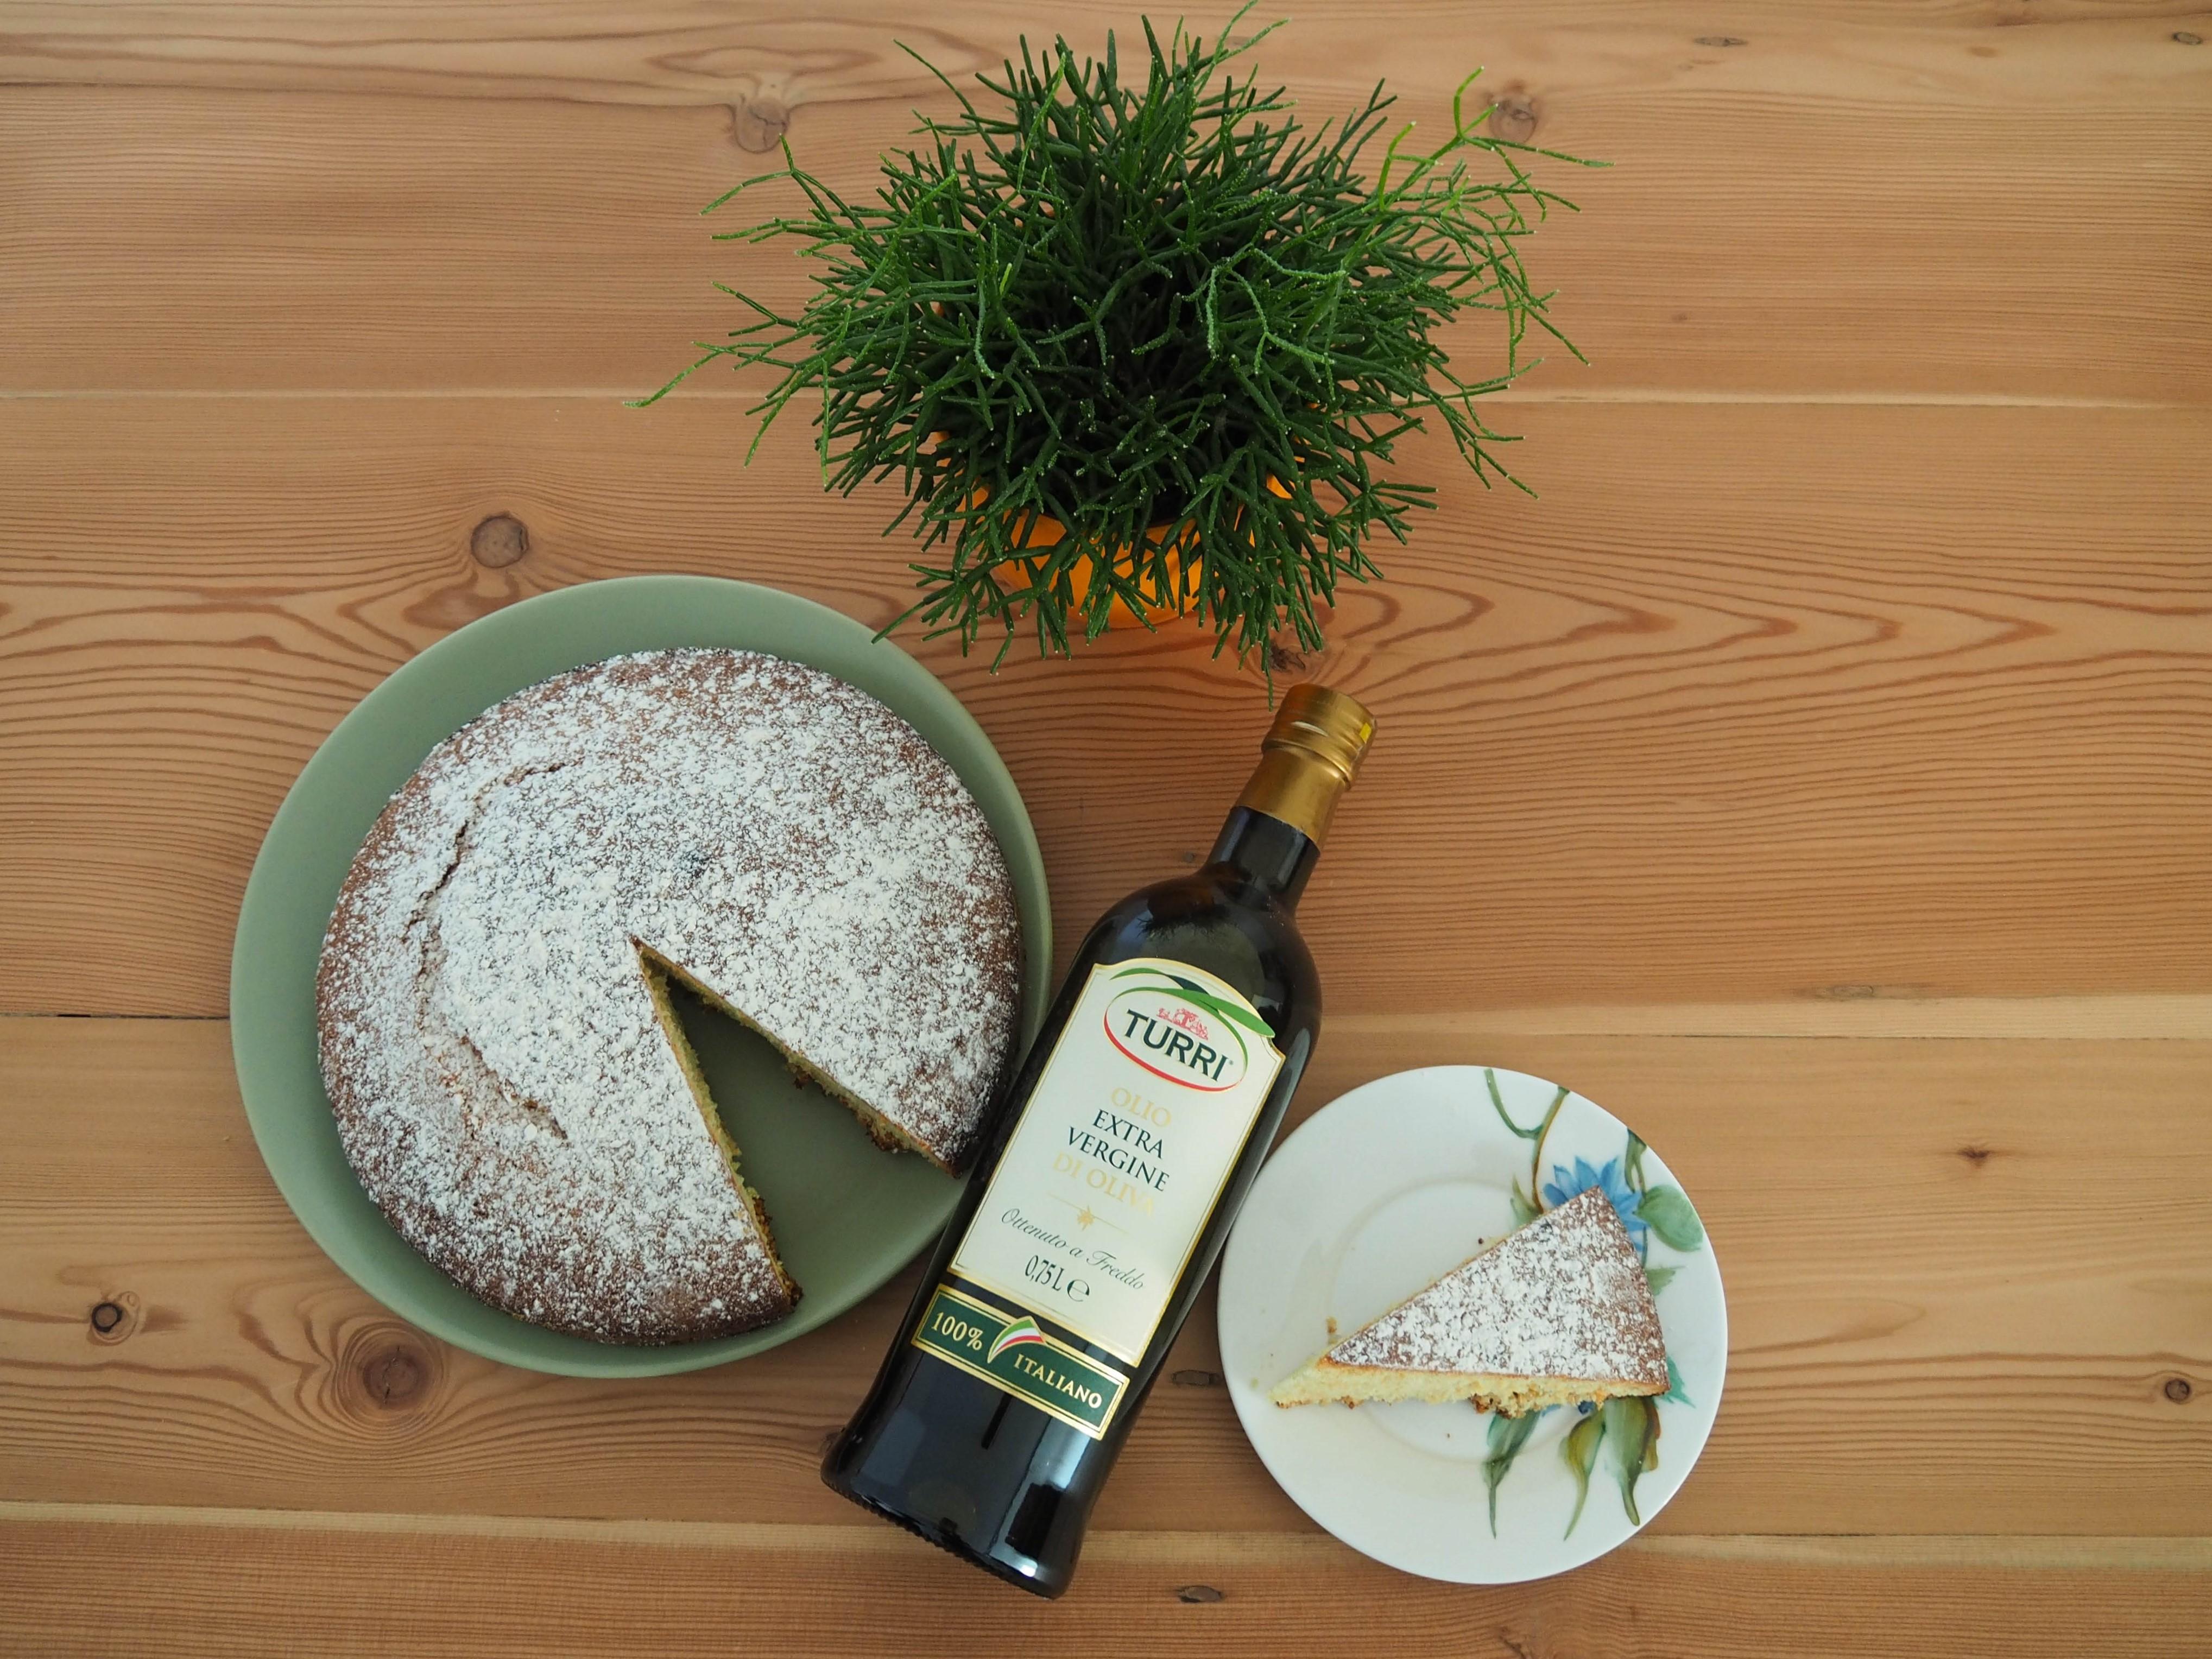 Ricetta Torta Paradiso all'Olio Extravergine d'oliva Turri